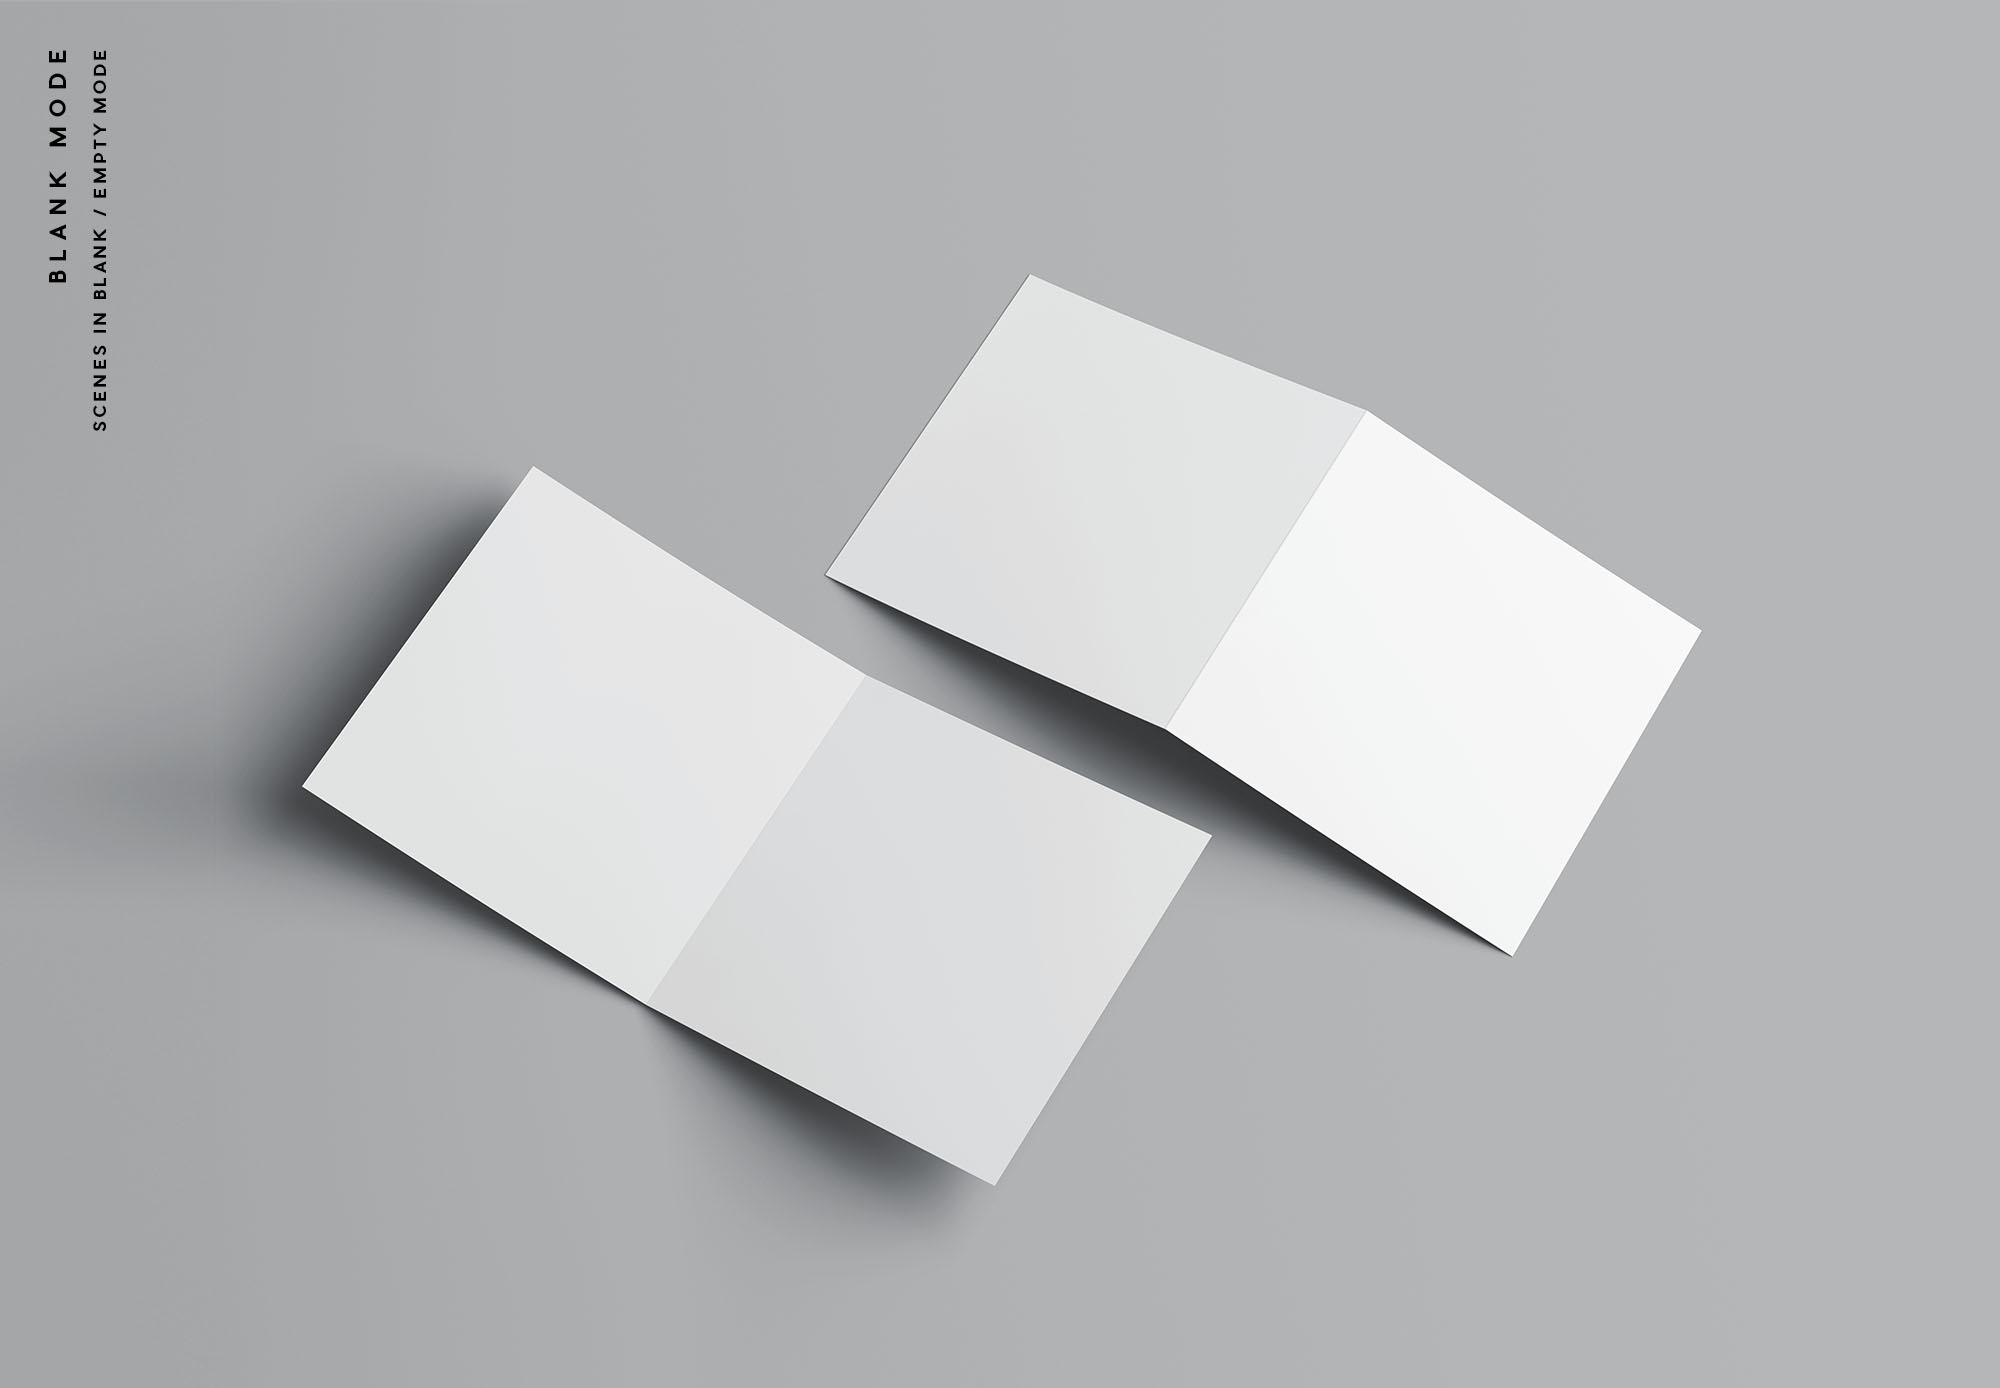 Square Bifold Brochure Mockup - Blank Mode